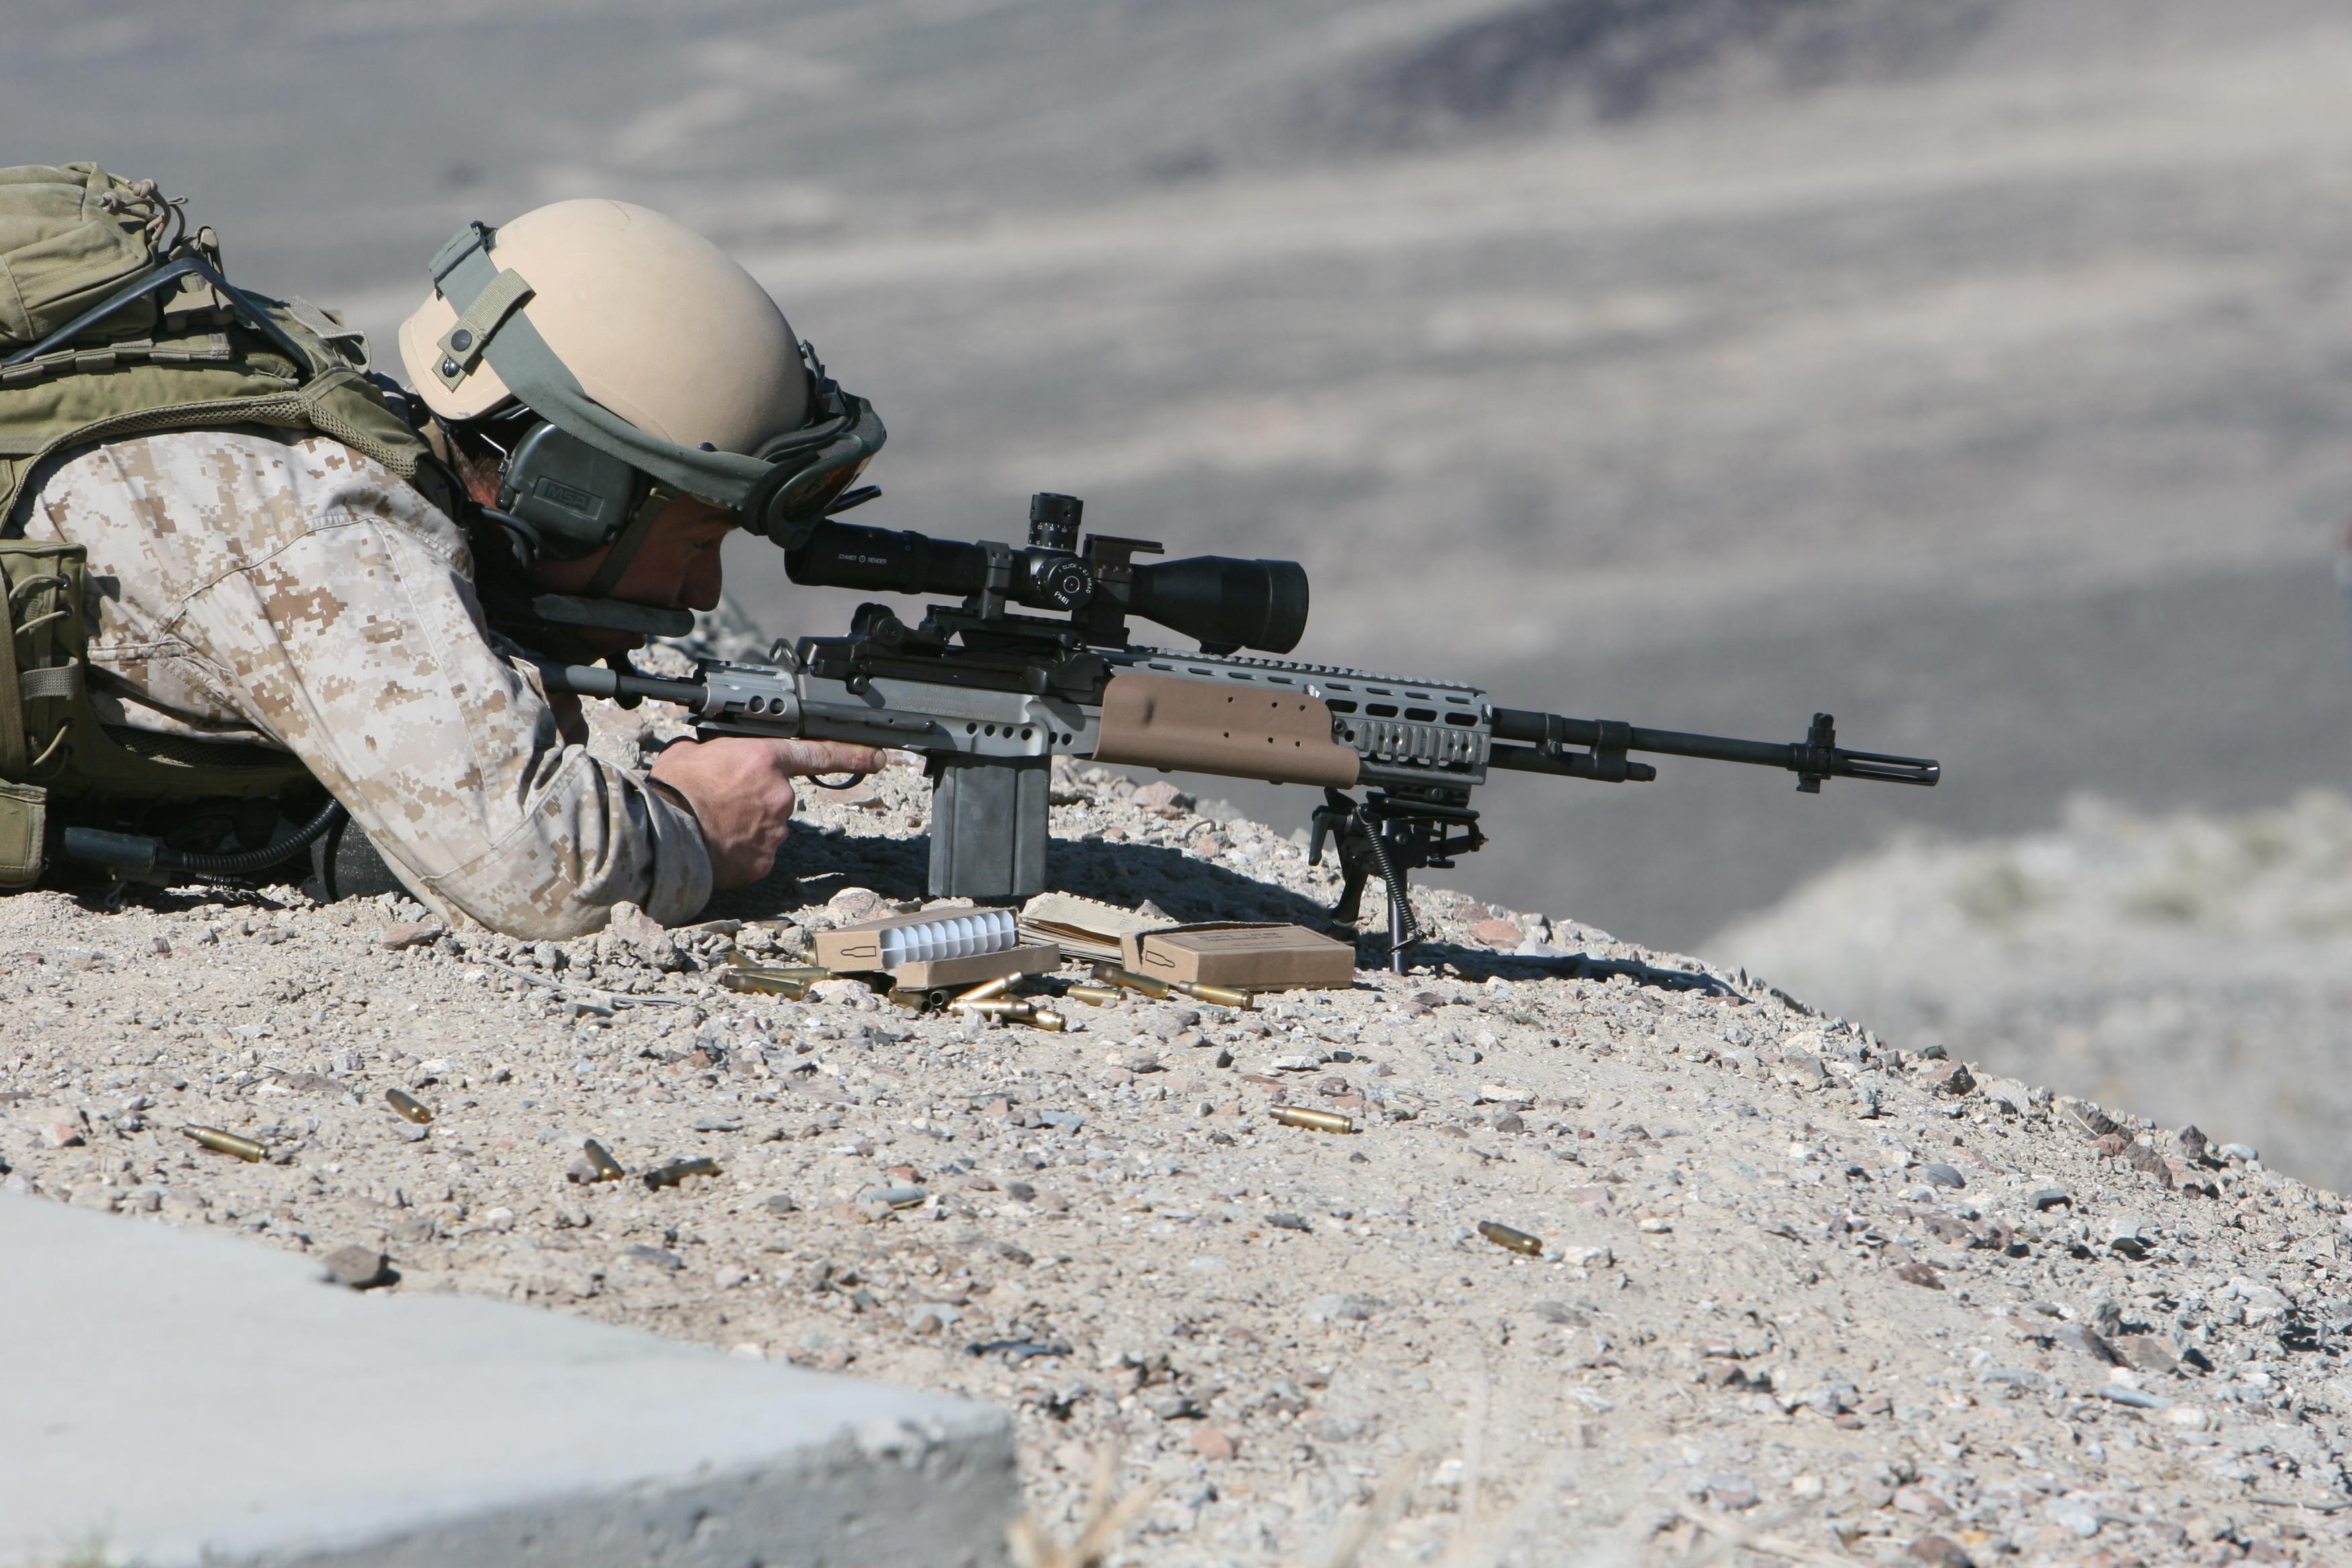 M39 Enhanced Marksman Rifle - Wikipedia